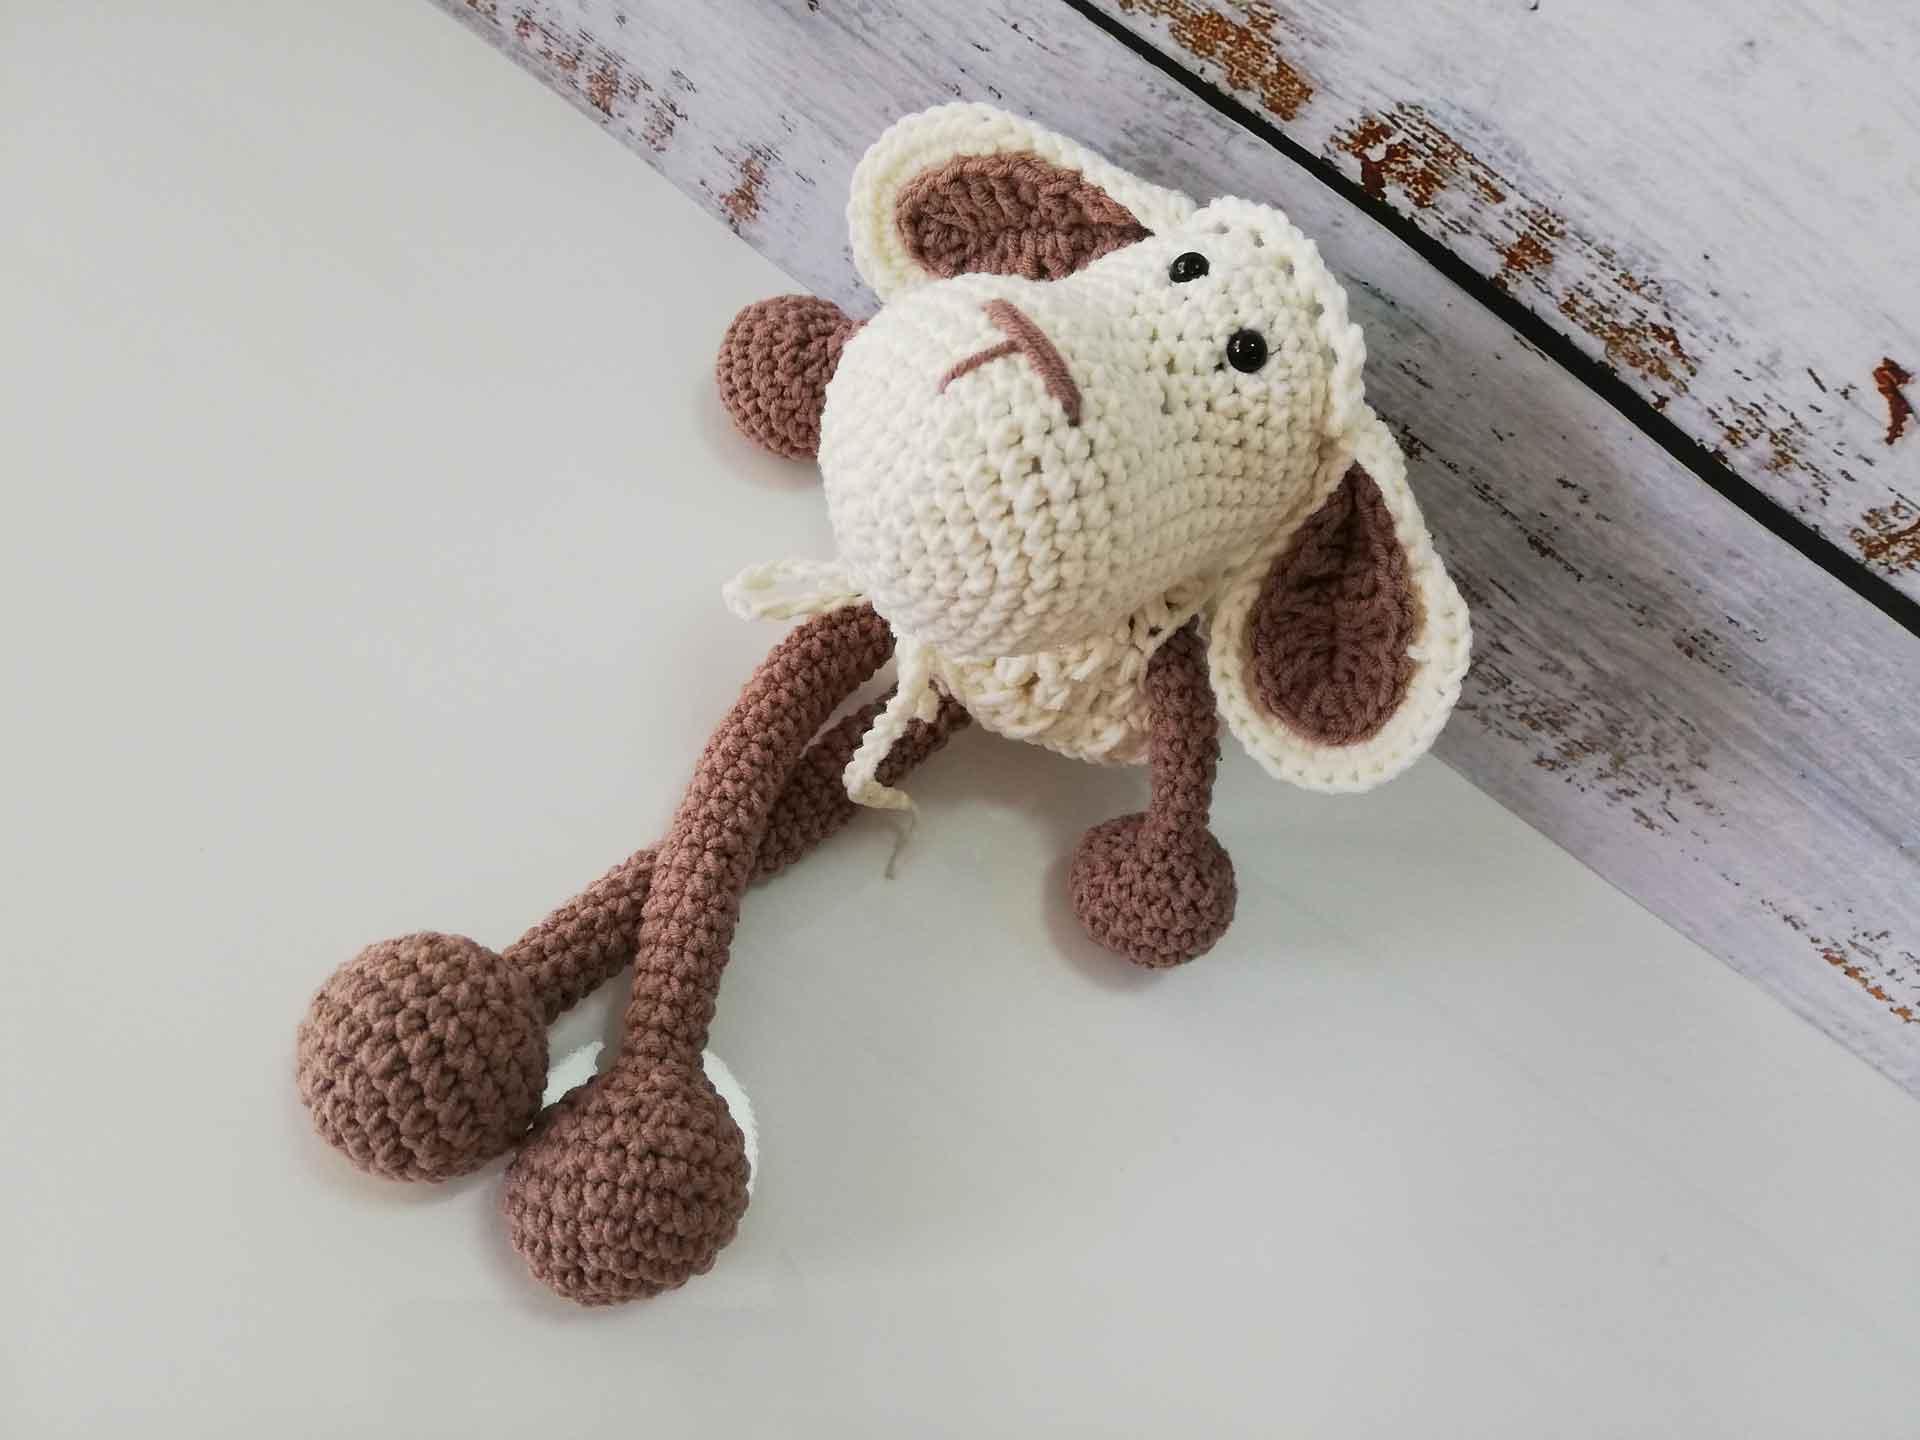 Amigurumi Toy Sheep Free Crochet Pattern | 1440x1920